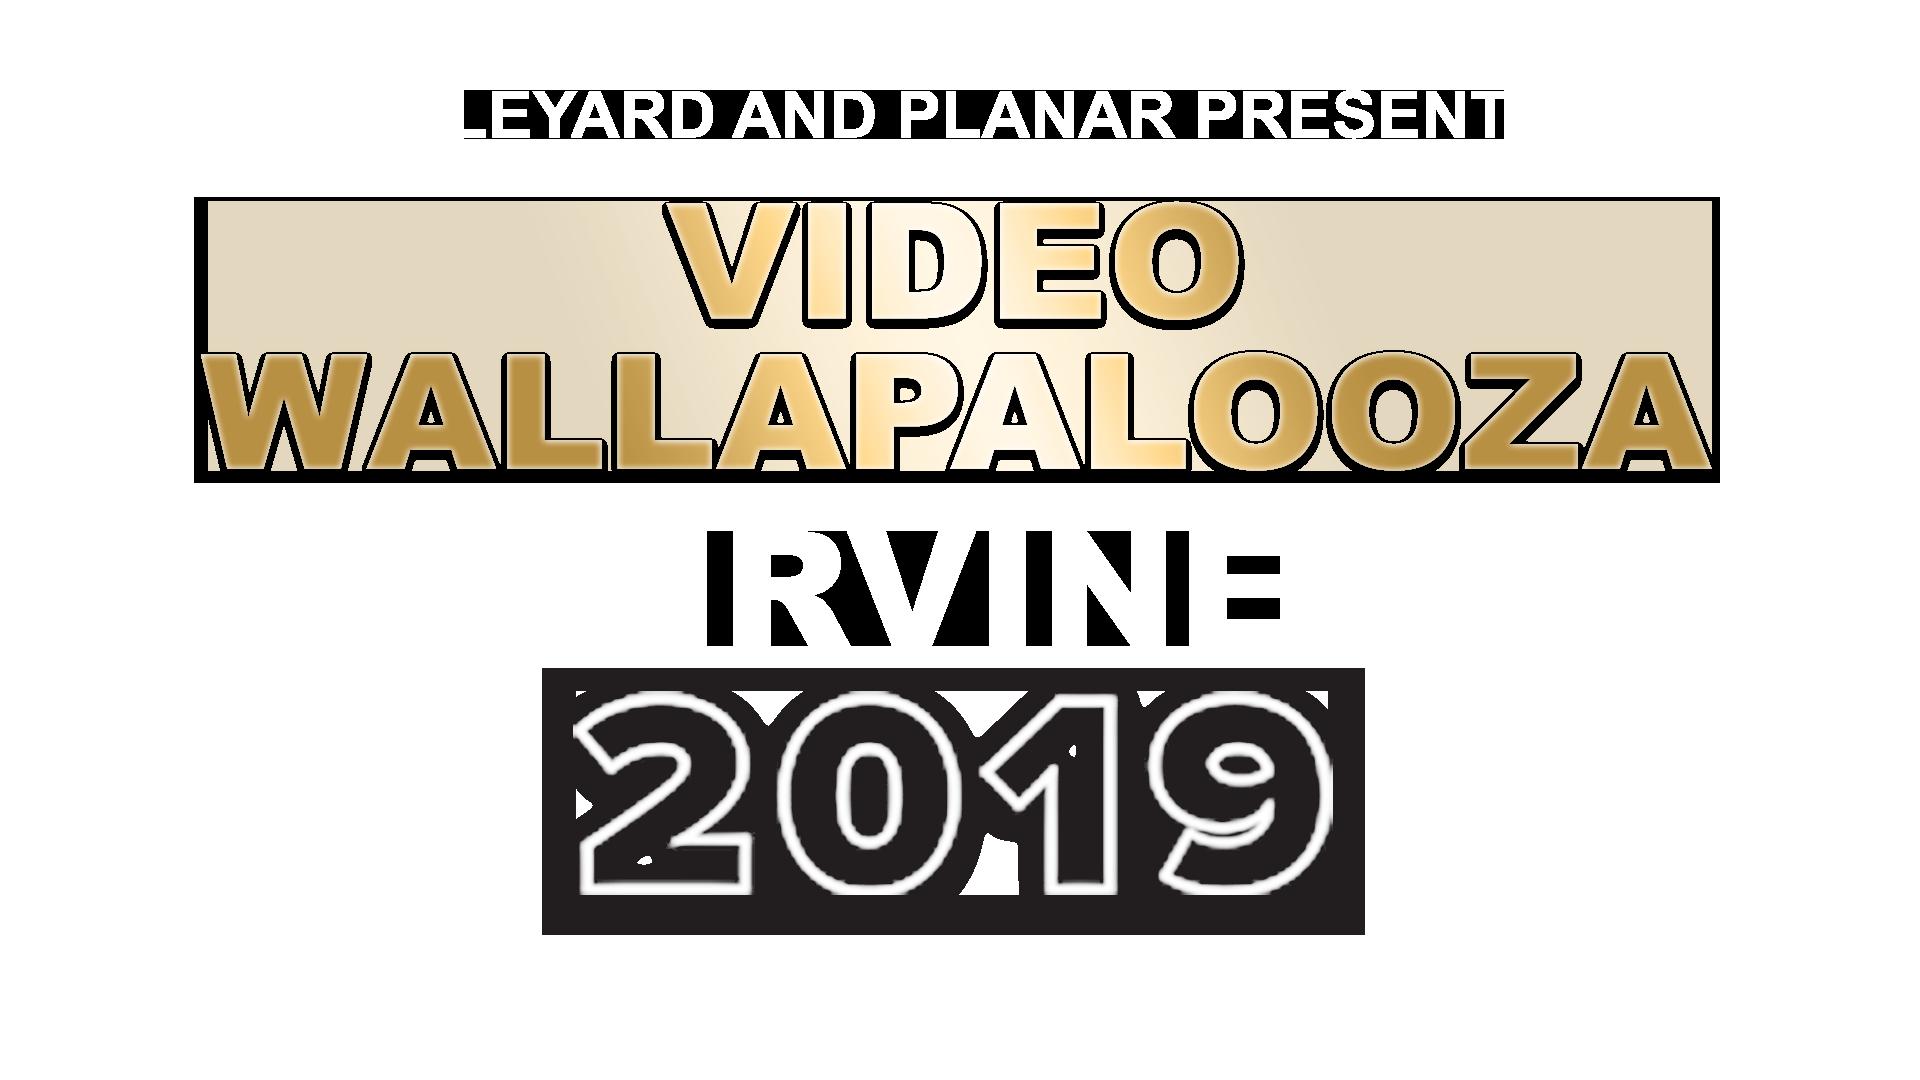 Leyard and Planar Present: Video Wallapalooza Roadshow 2019